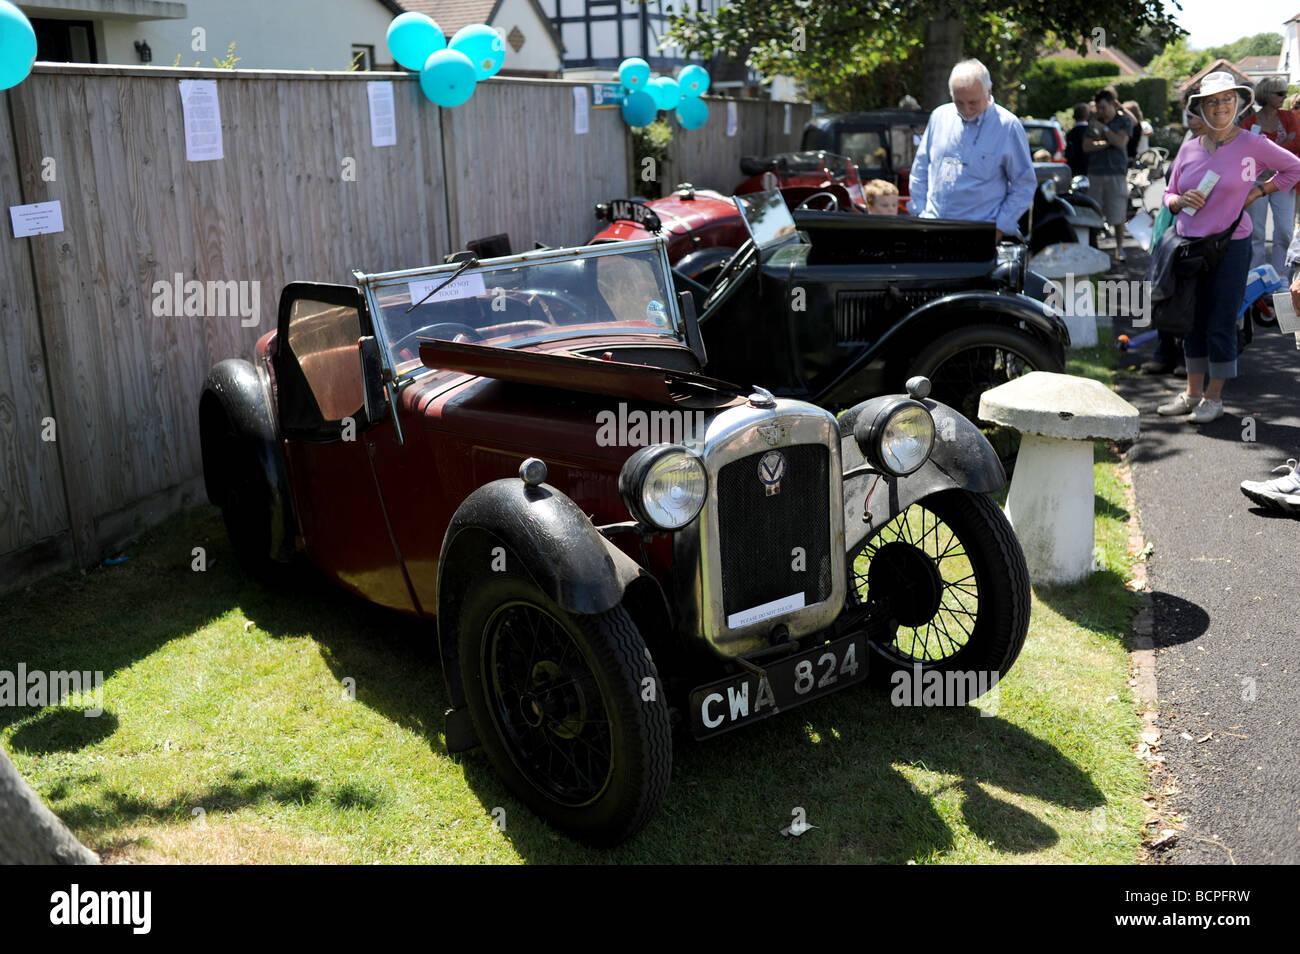 Old Austin cars on display Stock Photo: 25081613 - Alamy